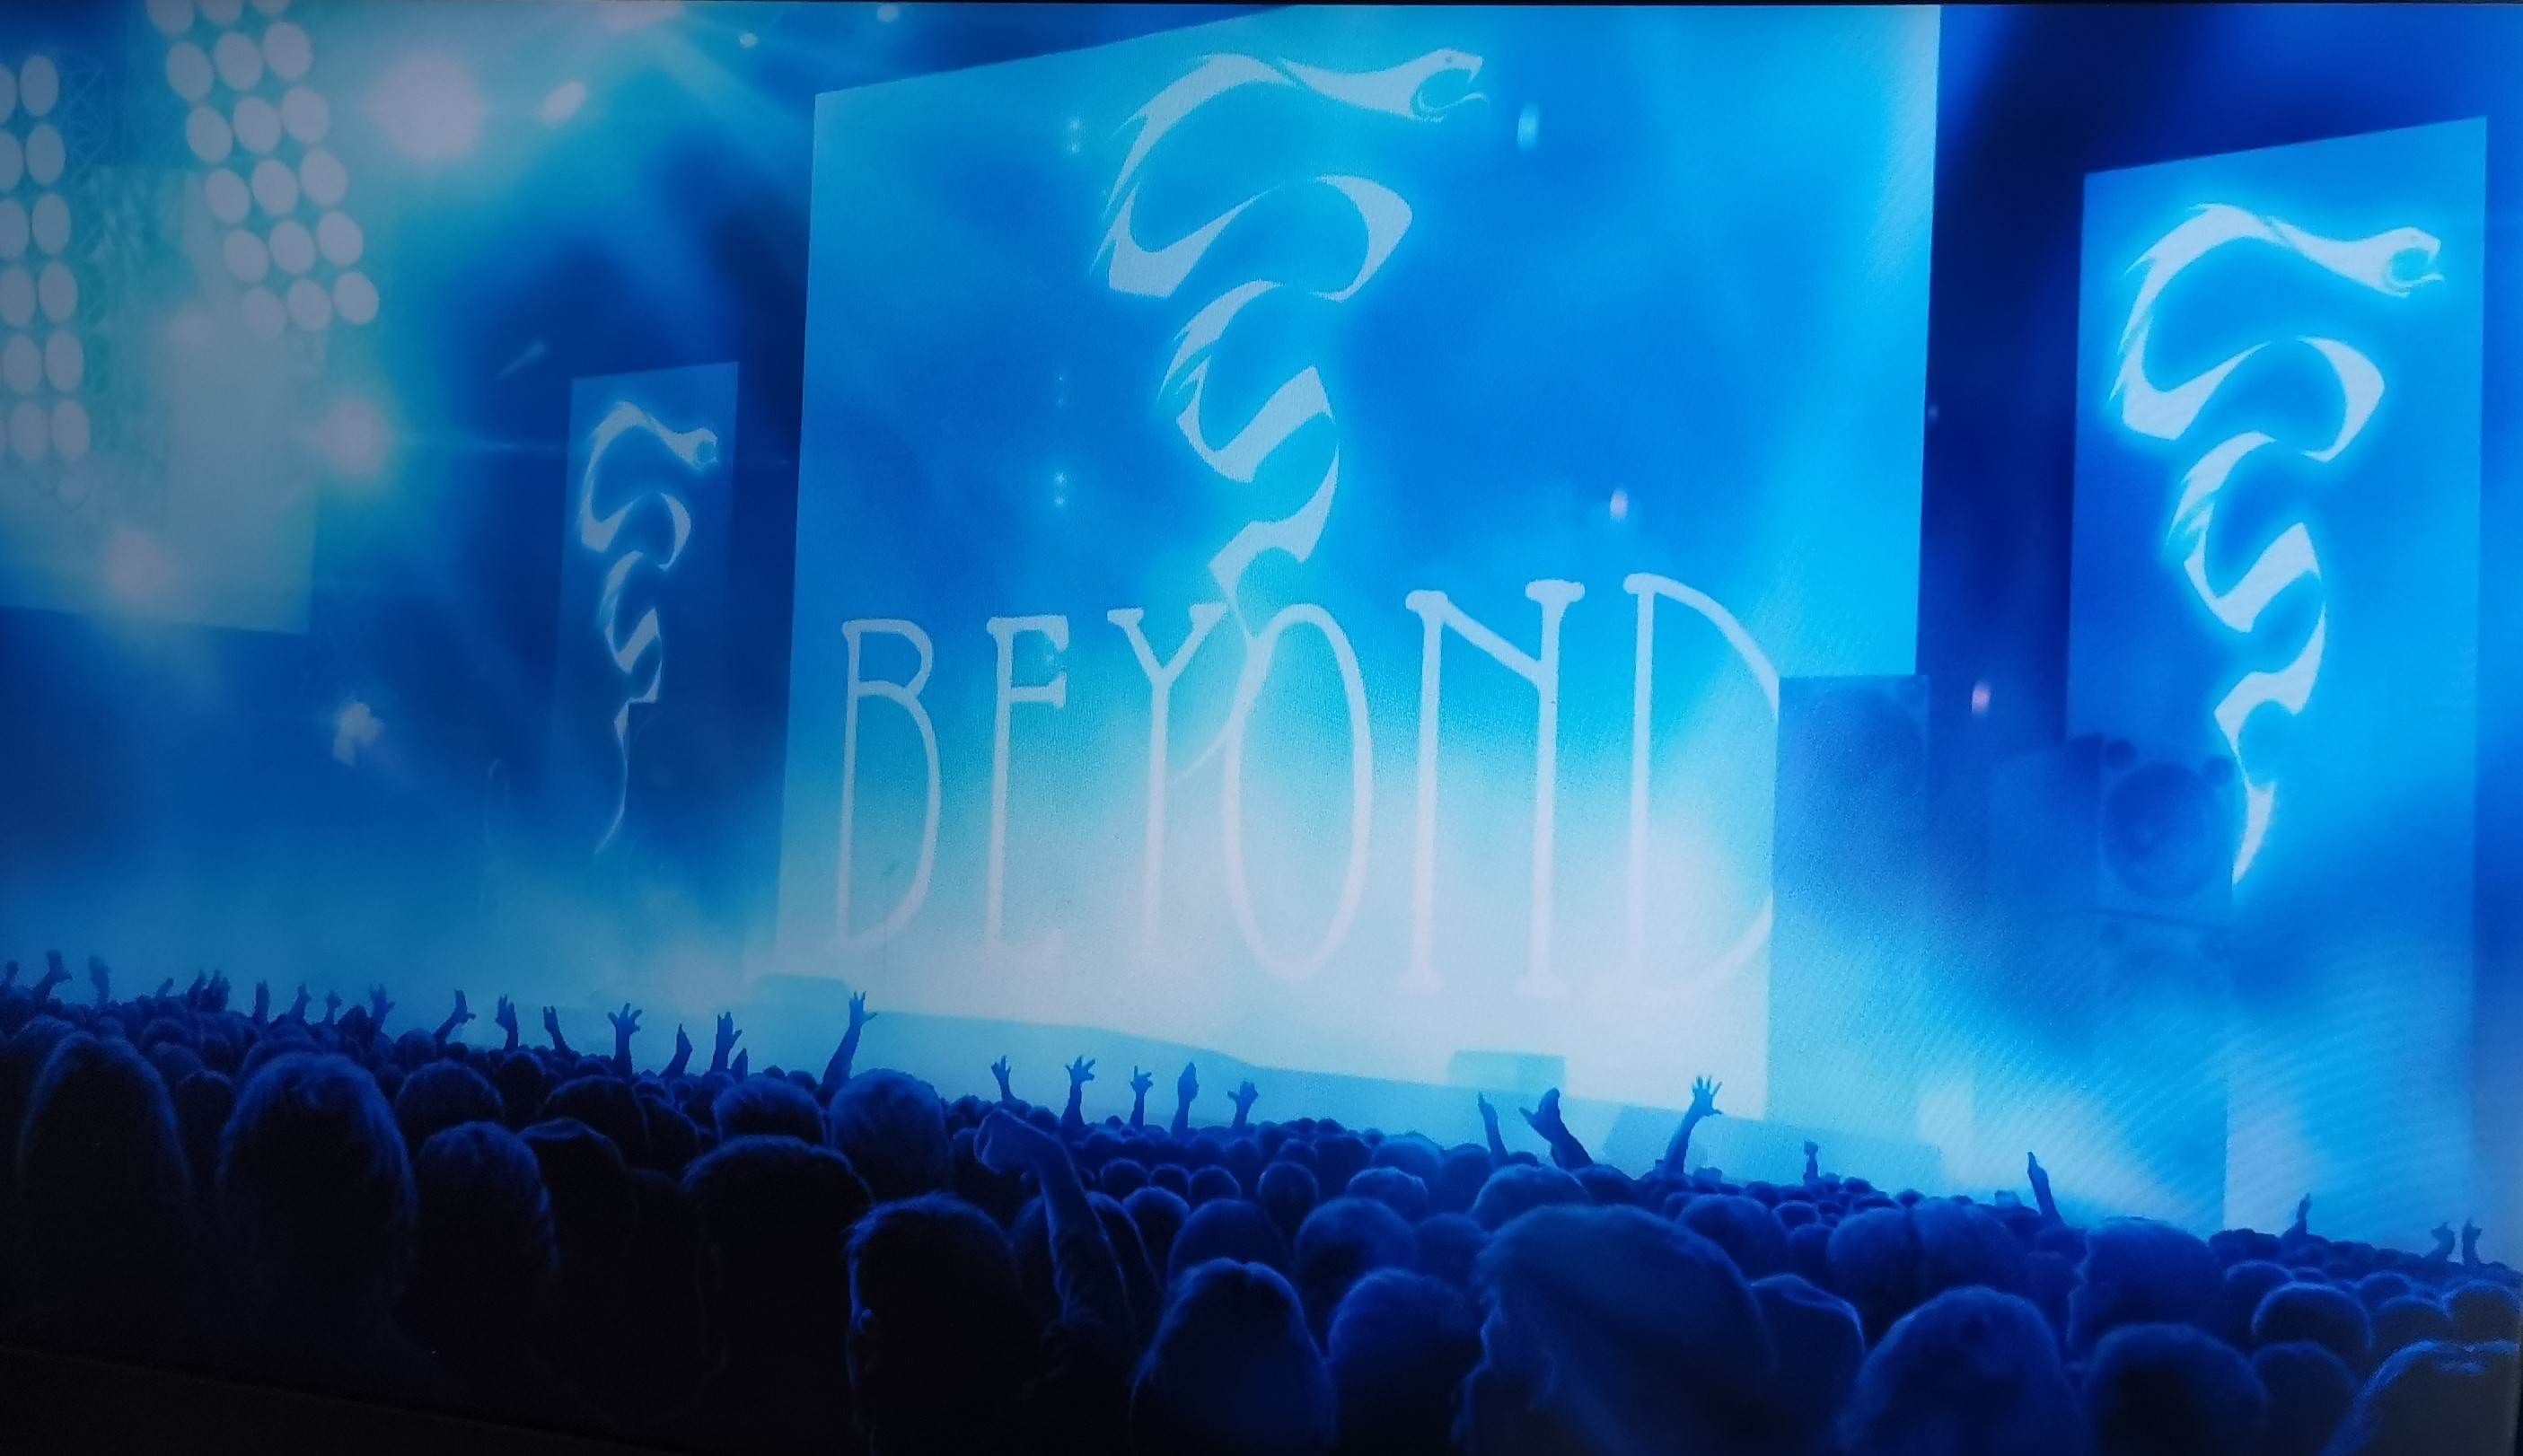 beyond kirtash album